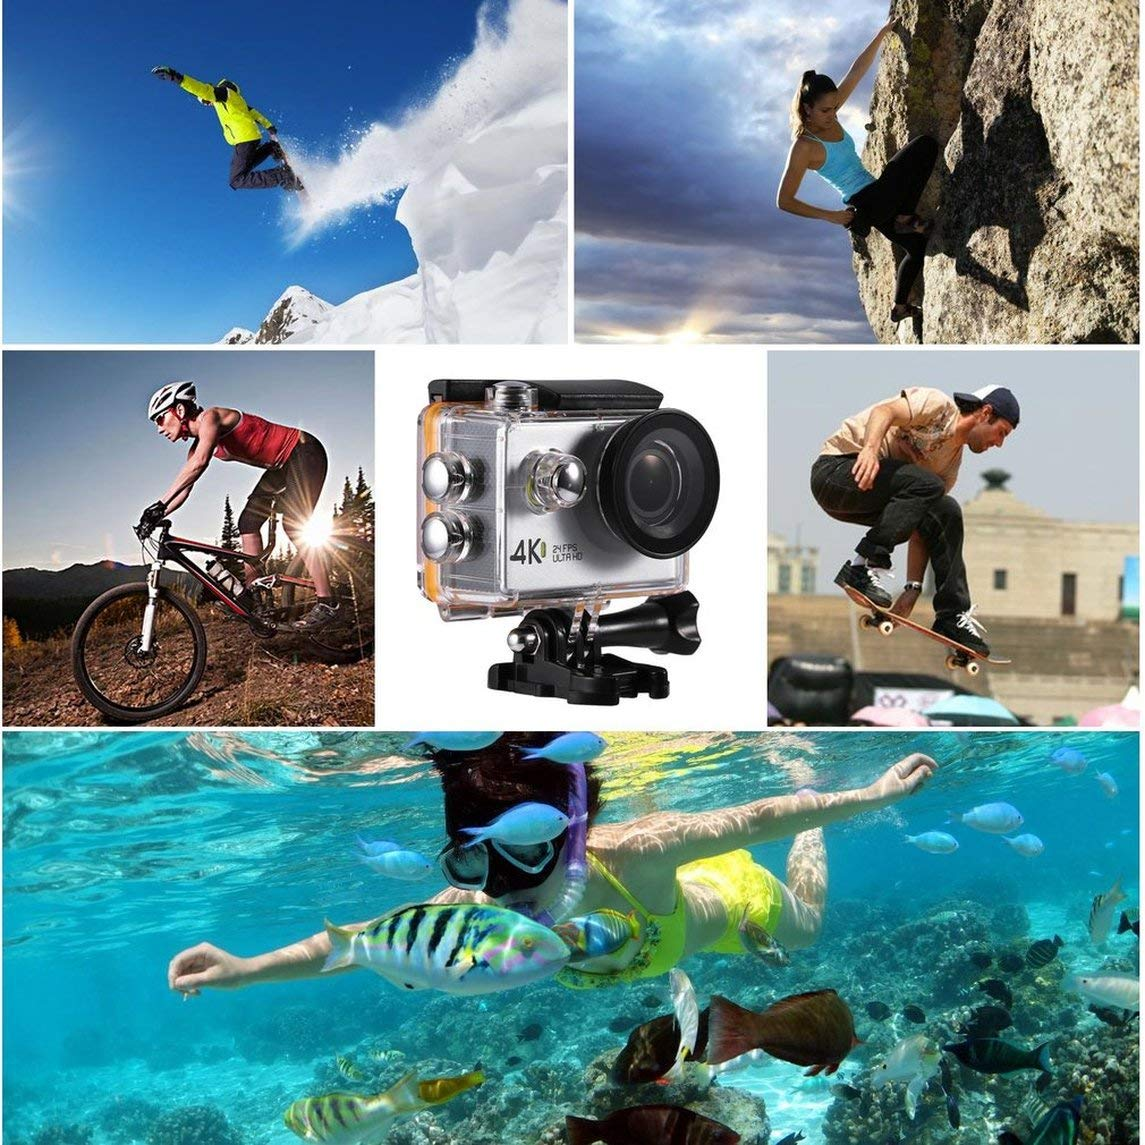 Footprintse G89 4K Ultra HD 1080P Mini Wasserdicht 30m Action Cam 2.0 Zoll LCD Display-Farbe  schwarz